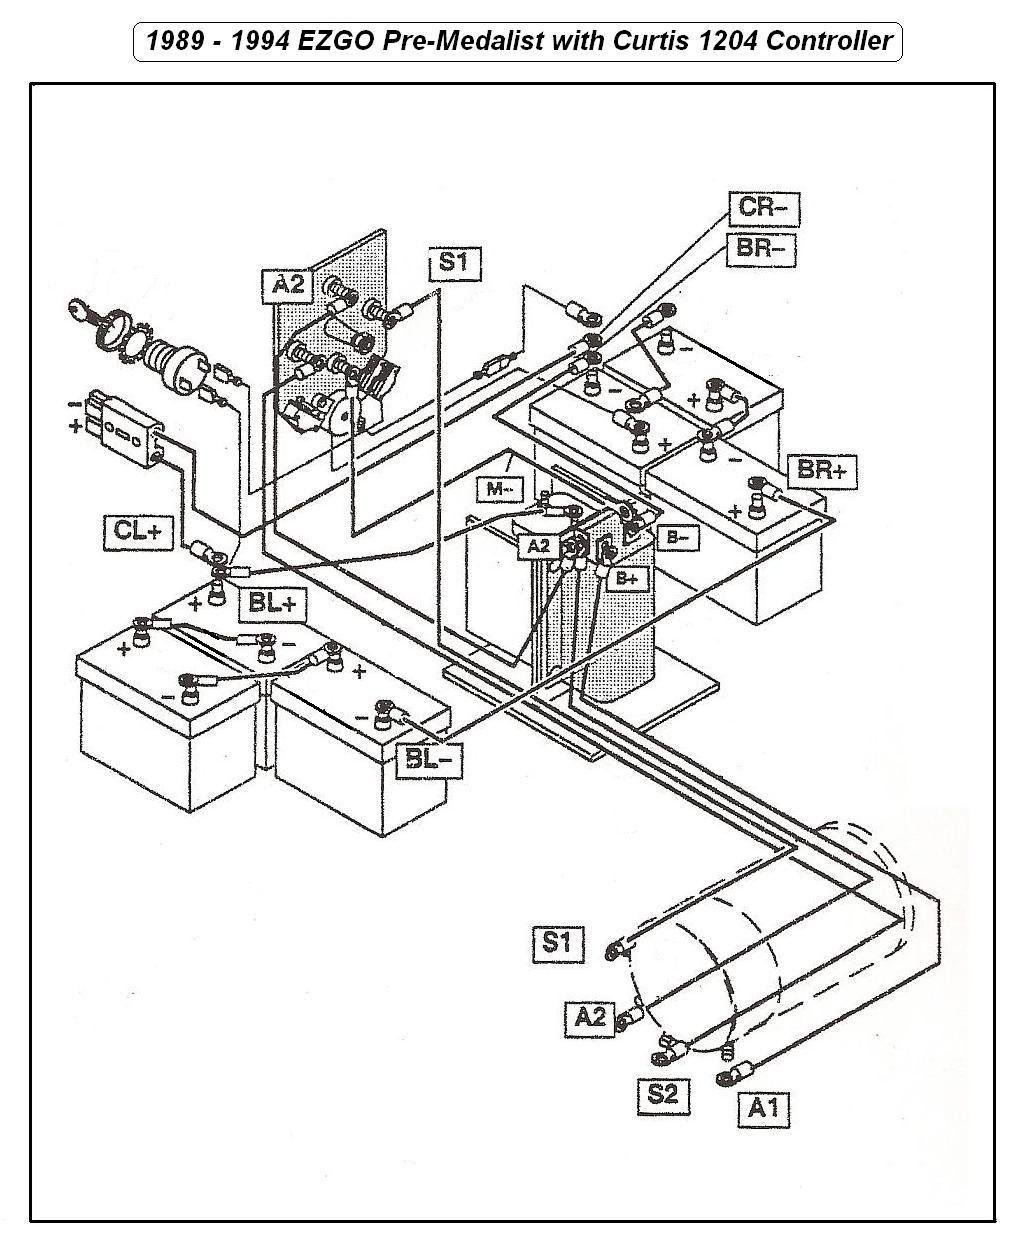 1992 Ezgo Wiring Diagram Wiring Diagram Aperture A Aperture A Zaafran It